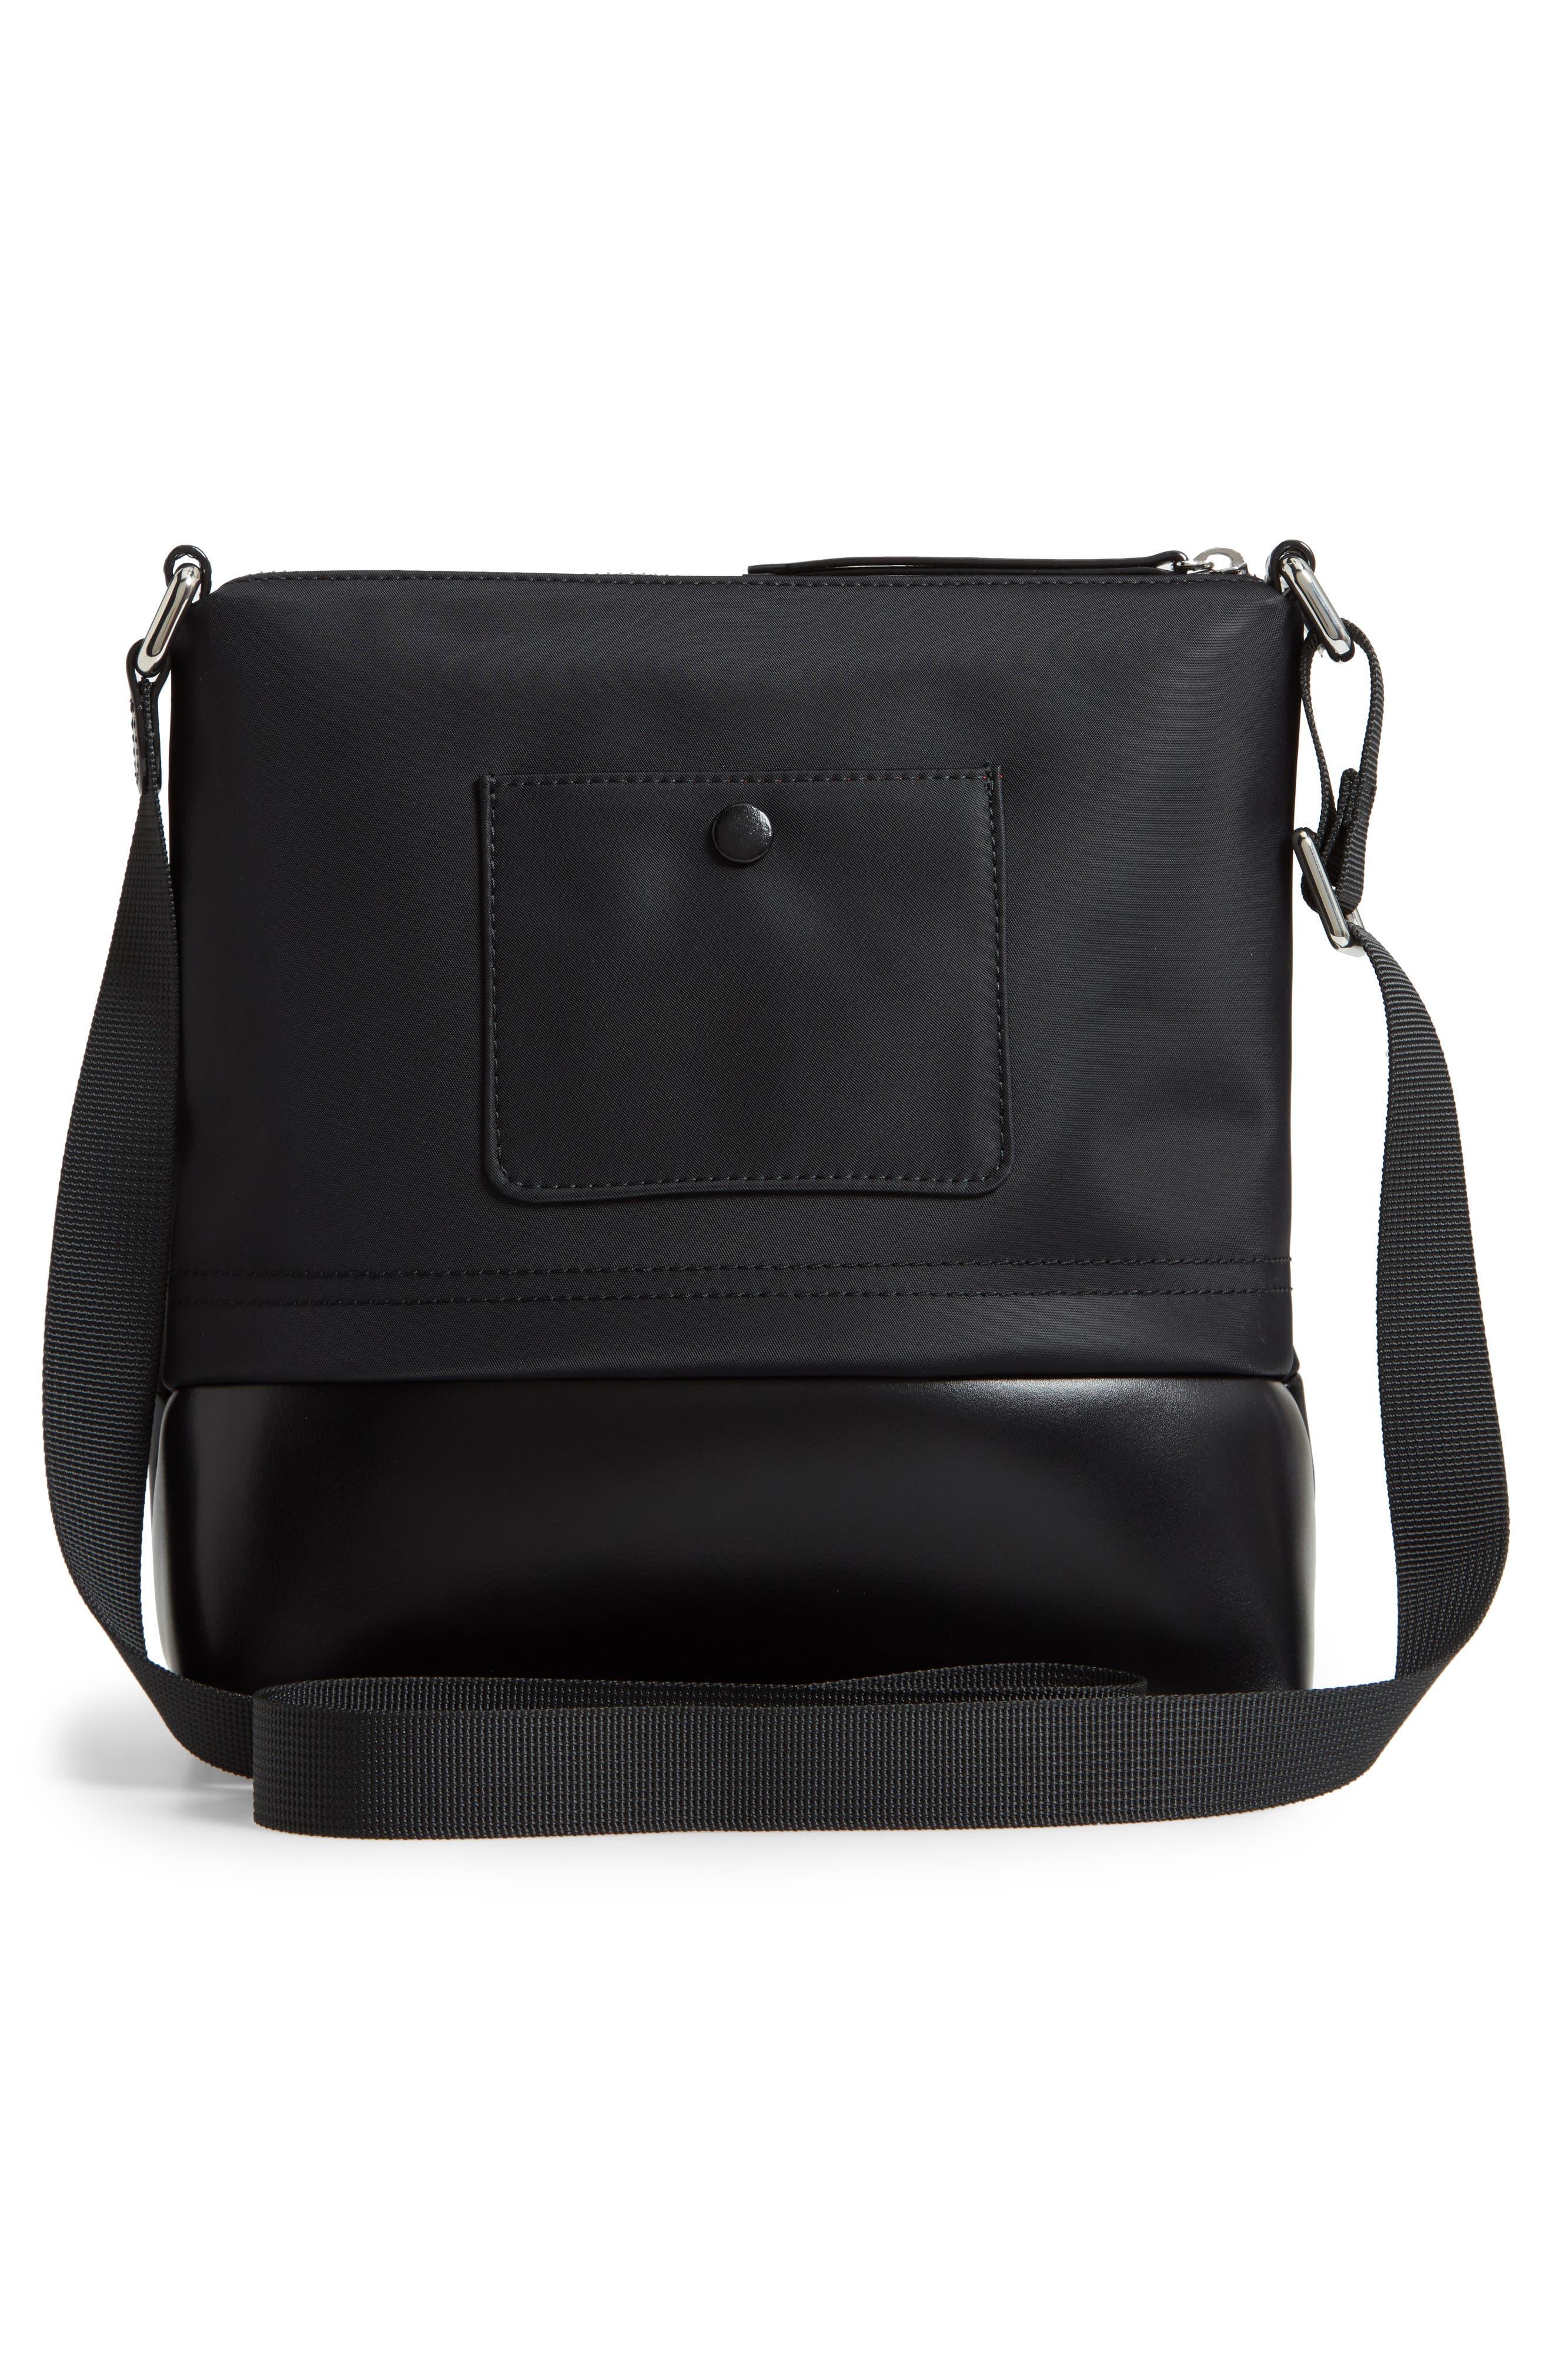 Wanda Nylon Sport RFID Travel Crossbody Bag,                             Alternate thumbnail 3, color,                             001